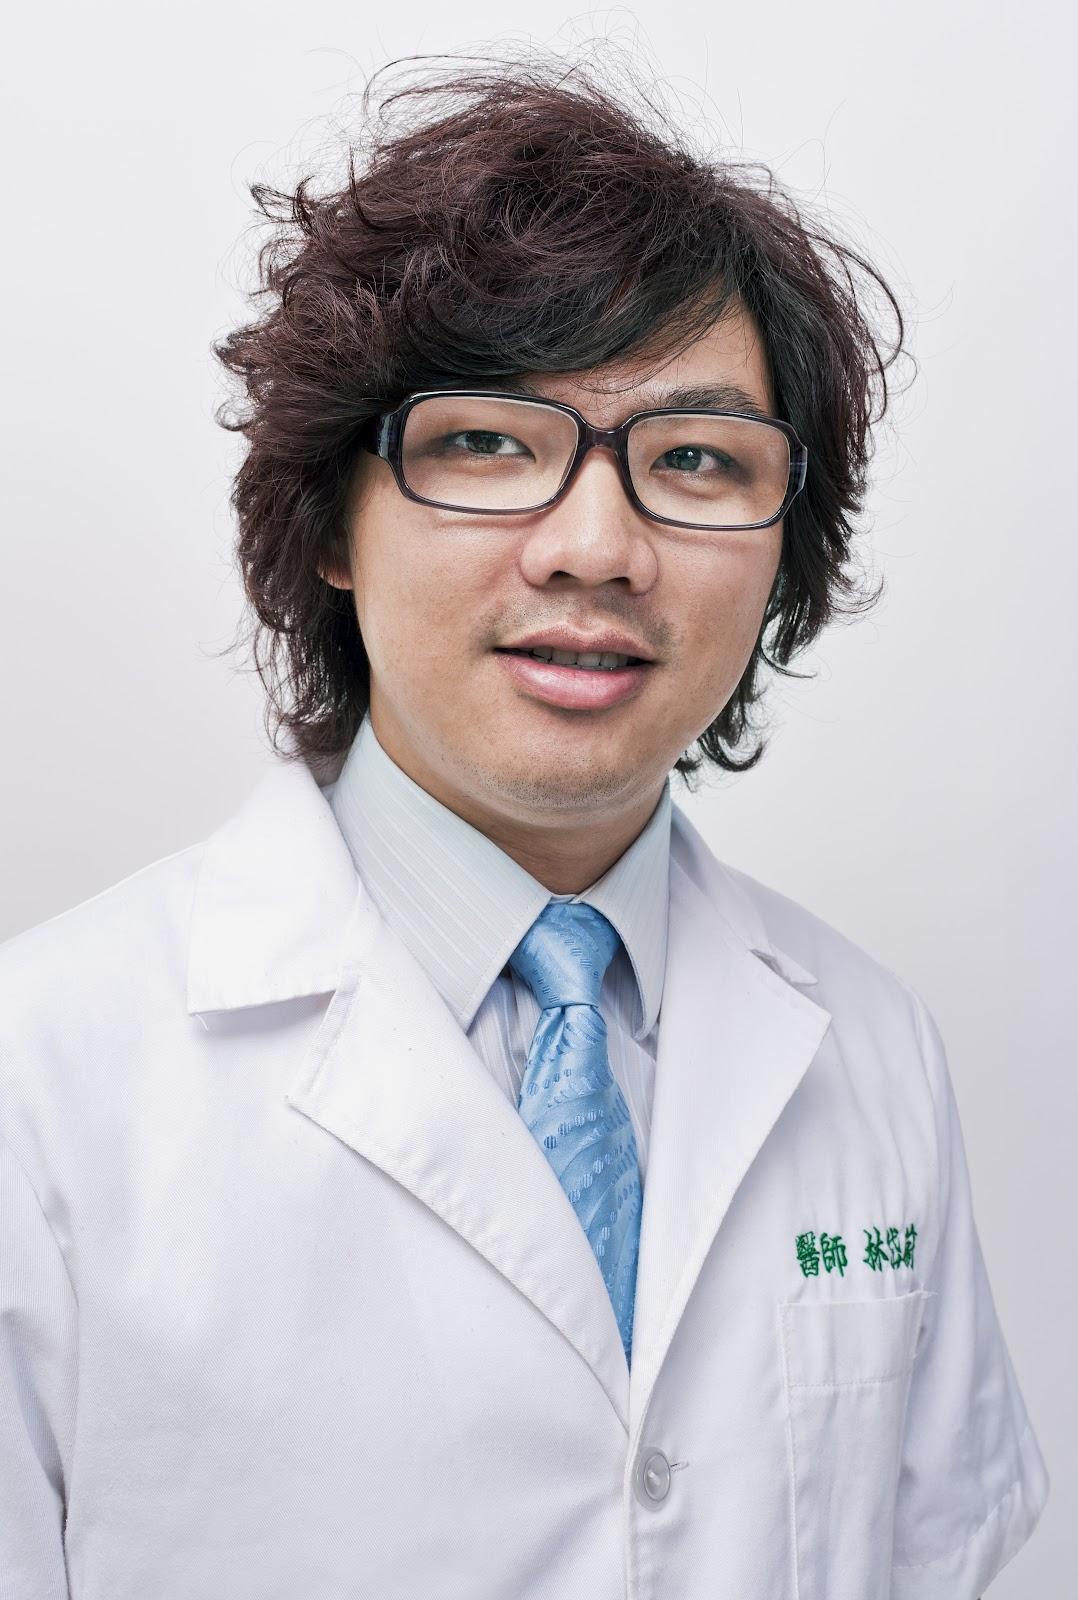 Dr. Wells 國維牙醫診所(高雄): 醫師簡介